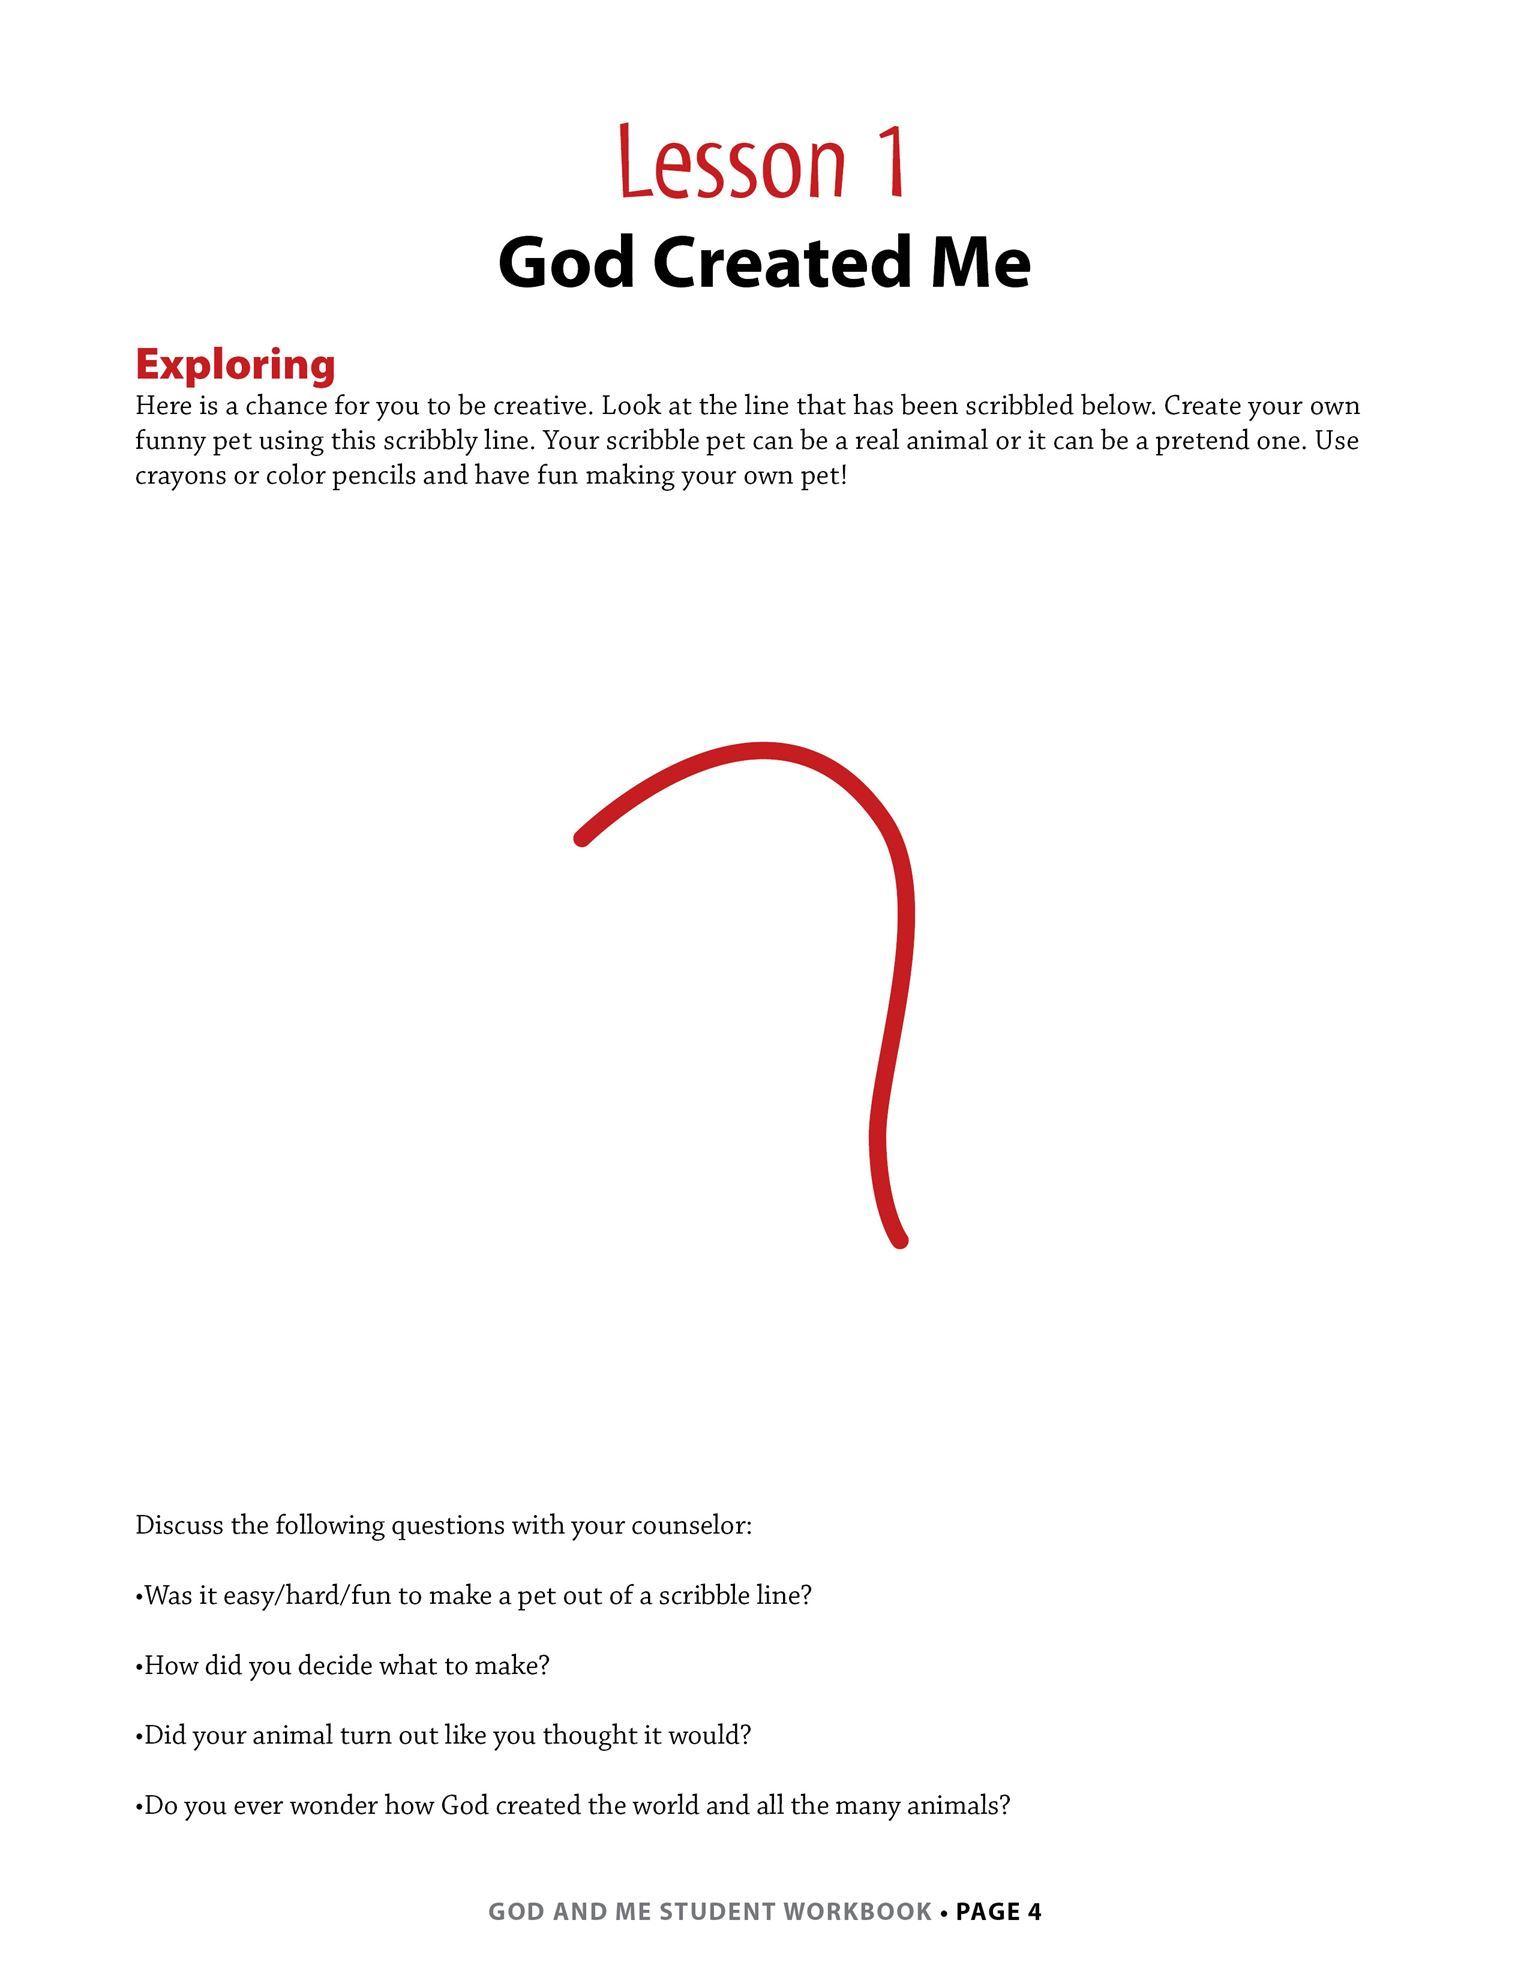 Lesson 1, page 4